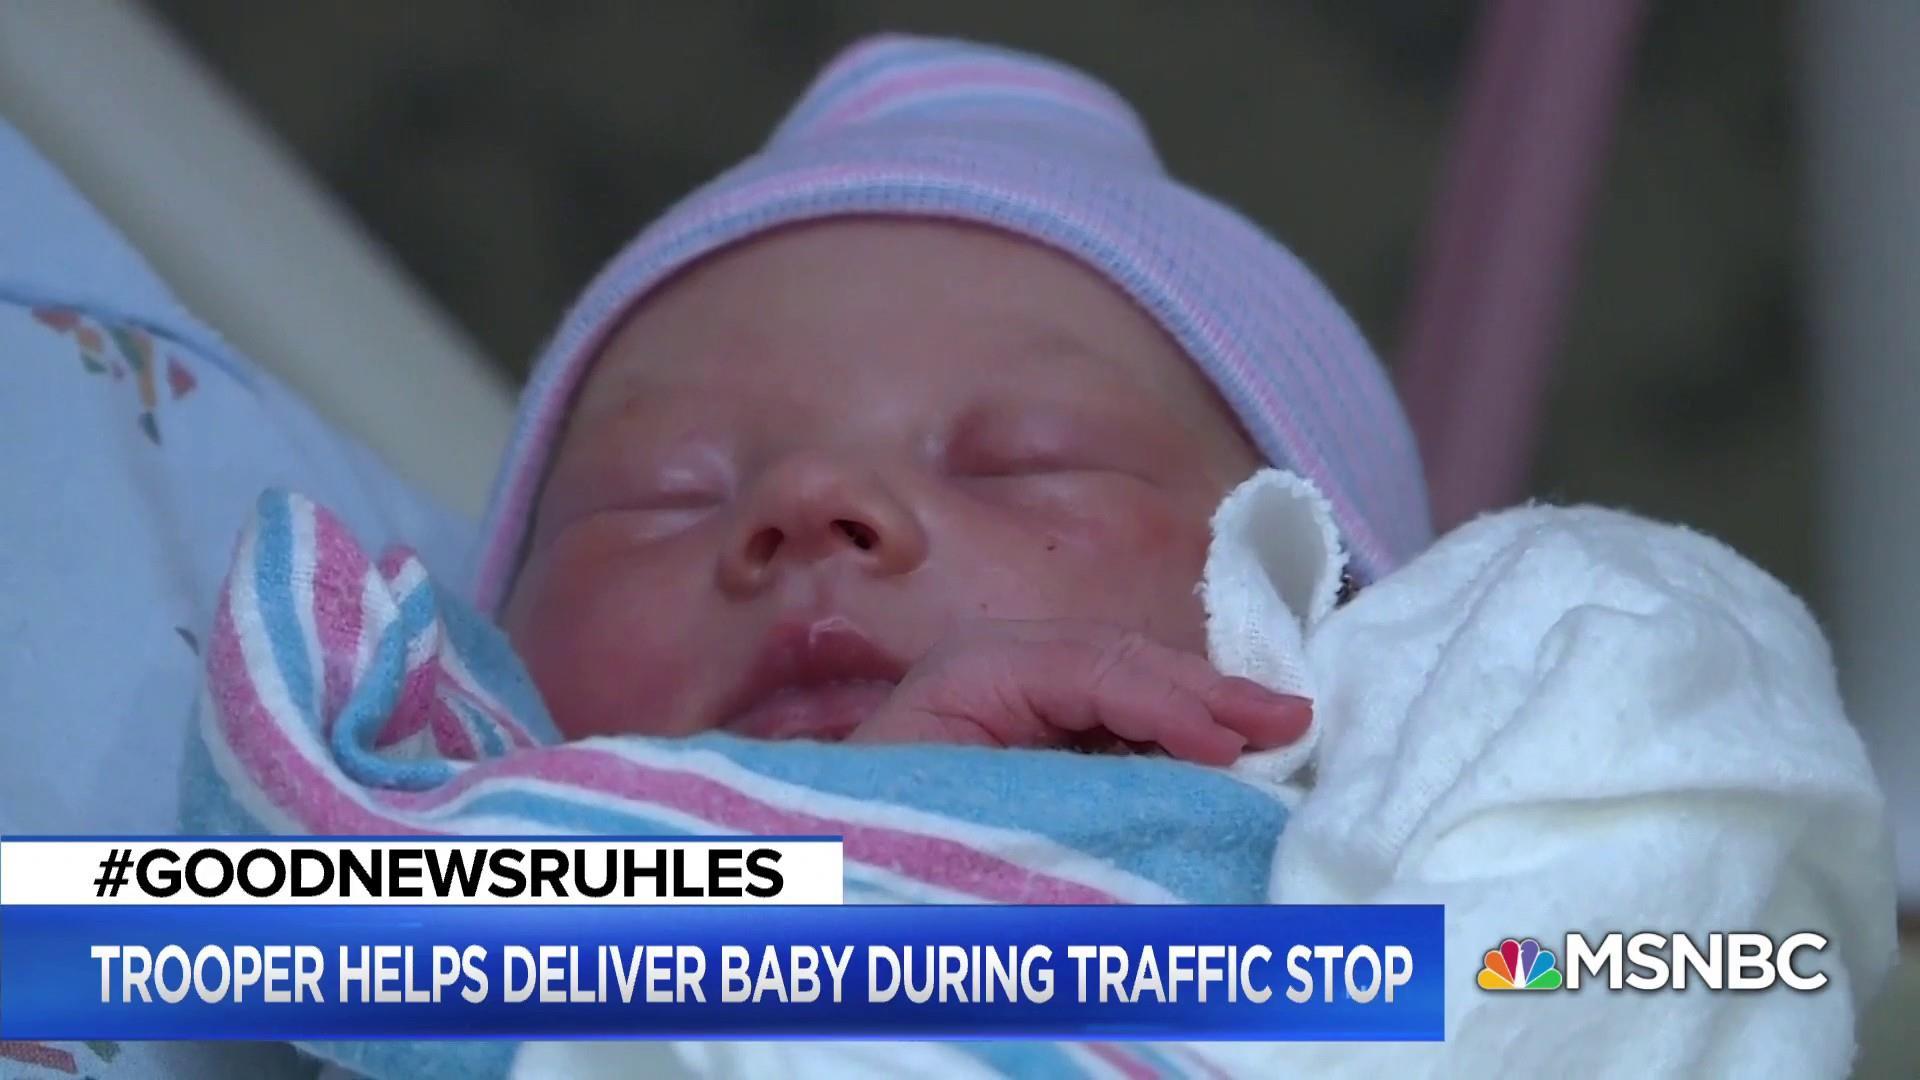 #GoodNewsRUHLES: Cop pulls over van, delivers passenger's baby